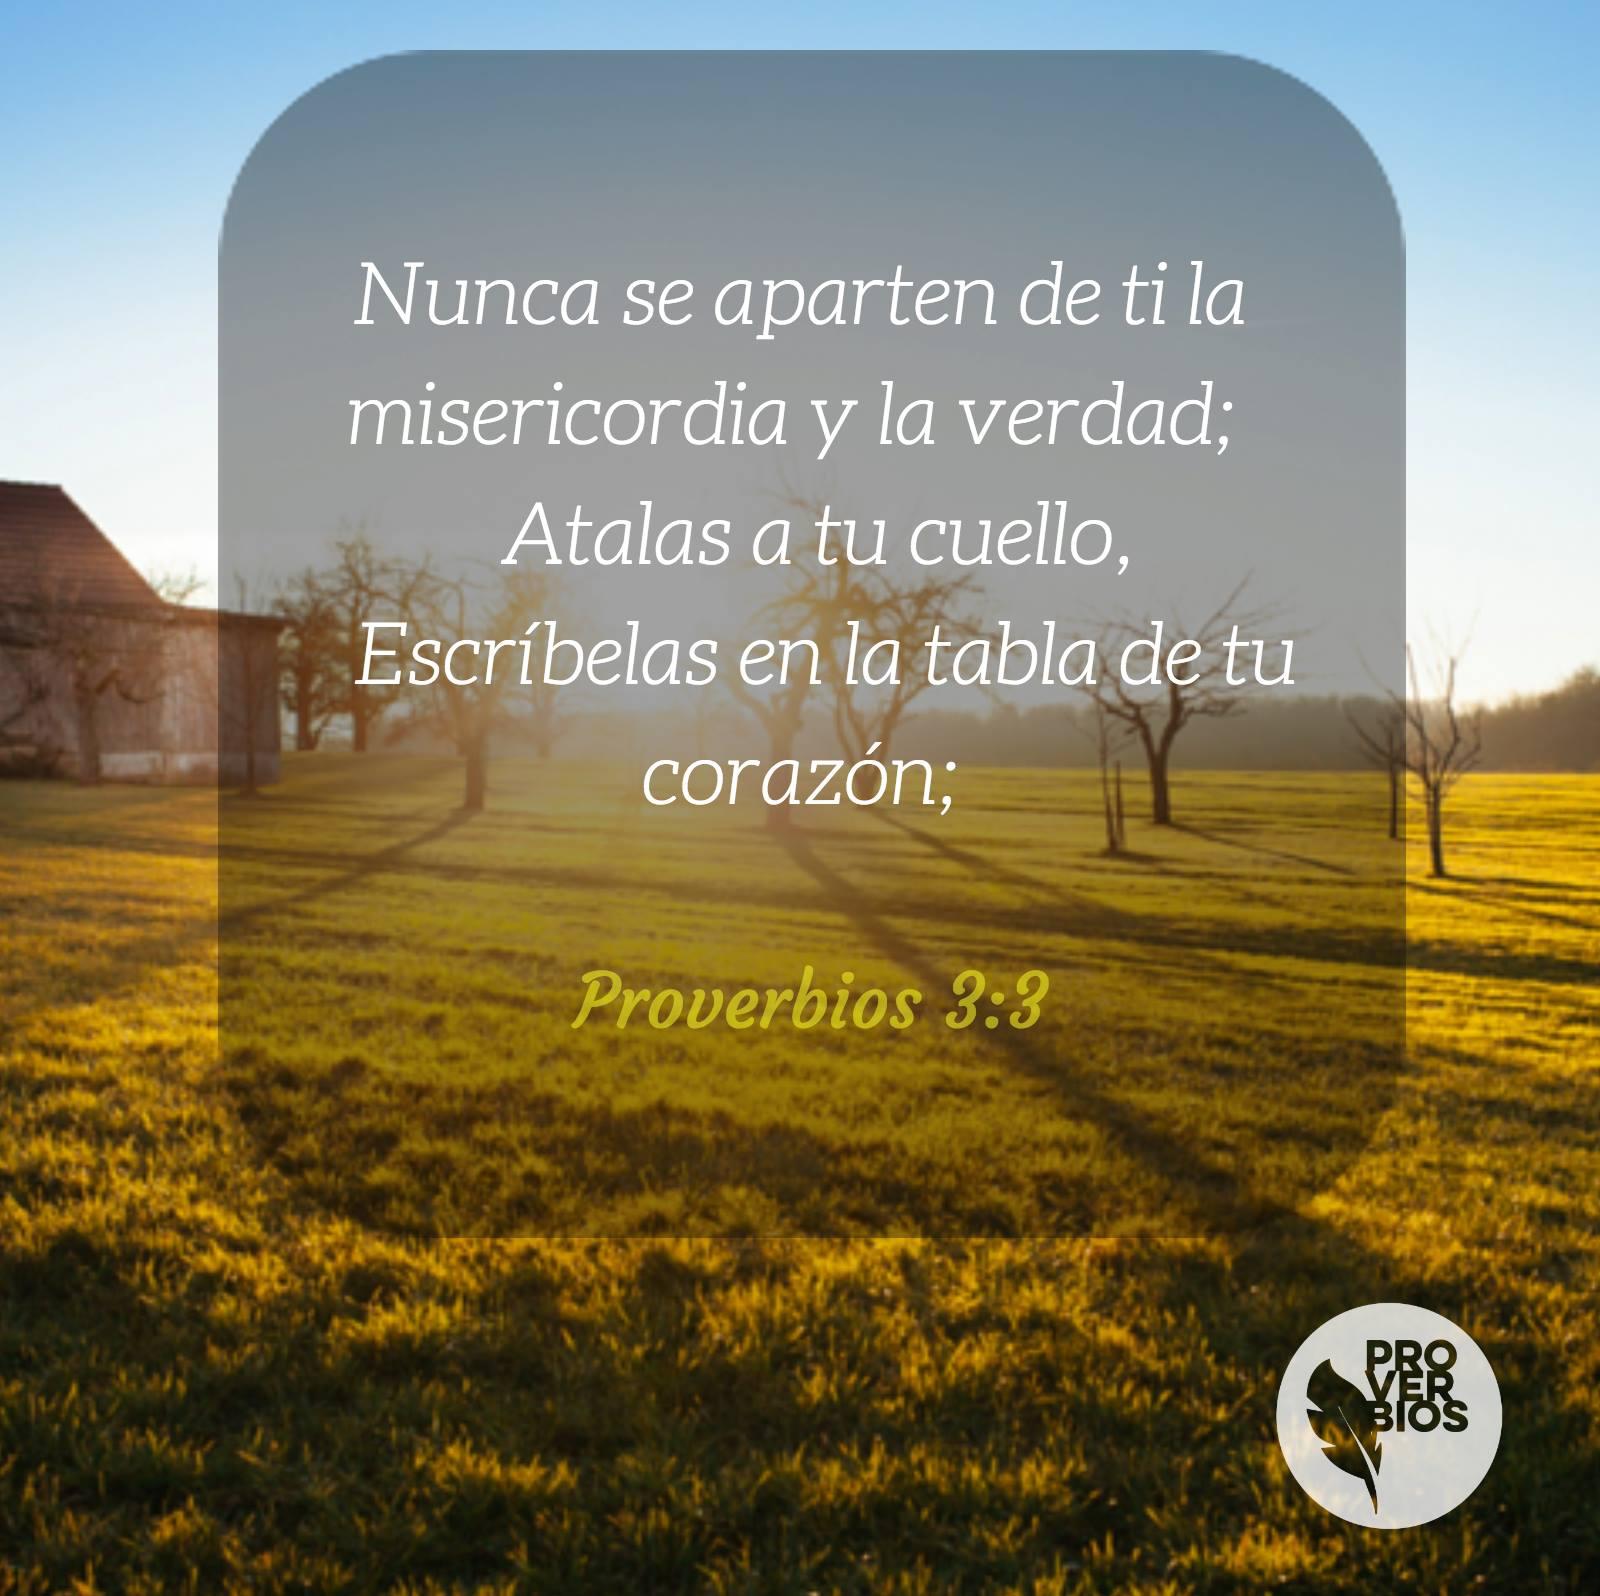 Proverbios bblicos imgenes bblicas aldeacms proverbios33 urtaz Images